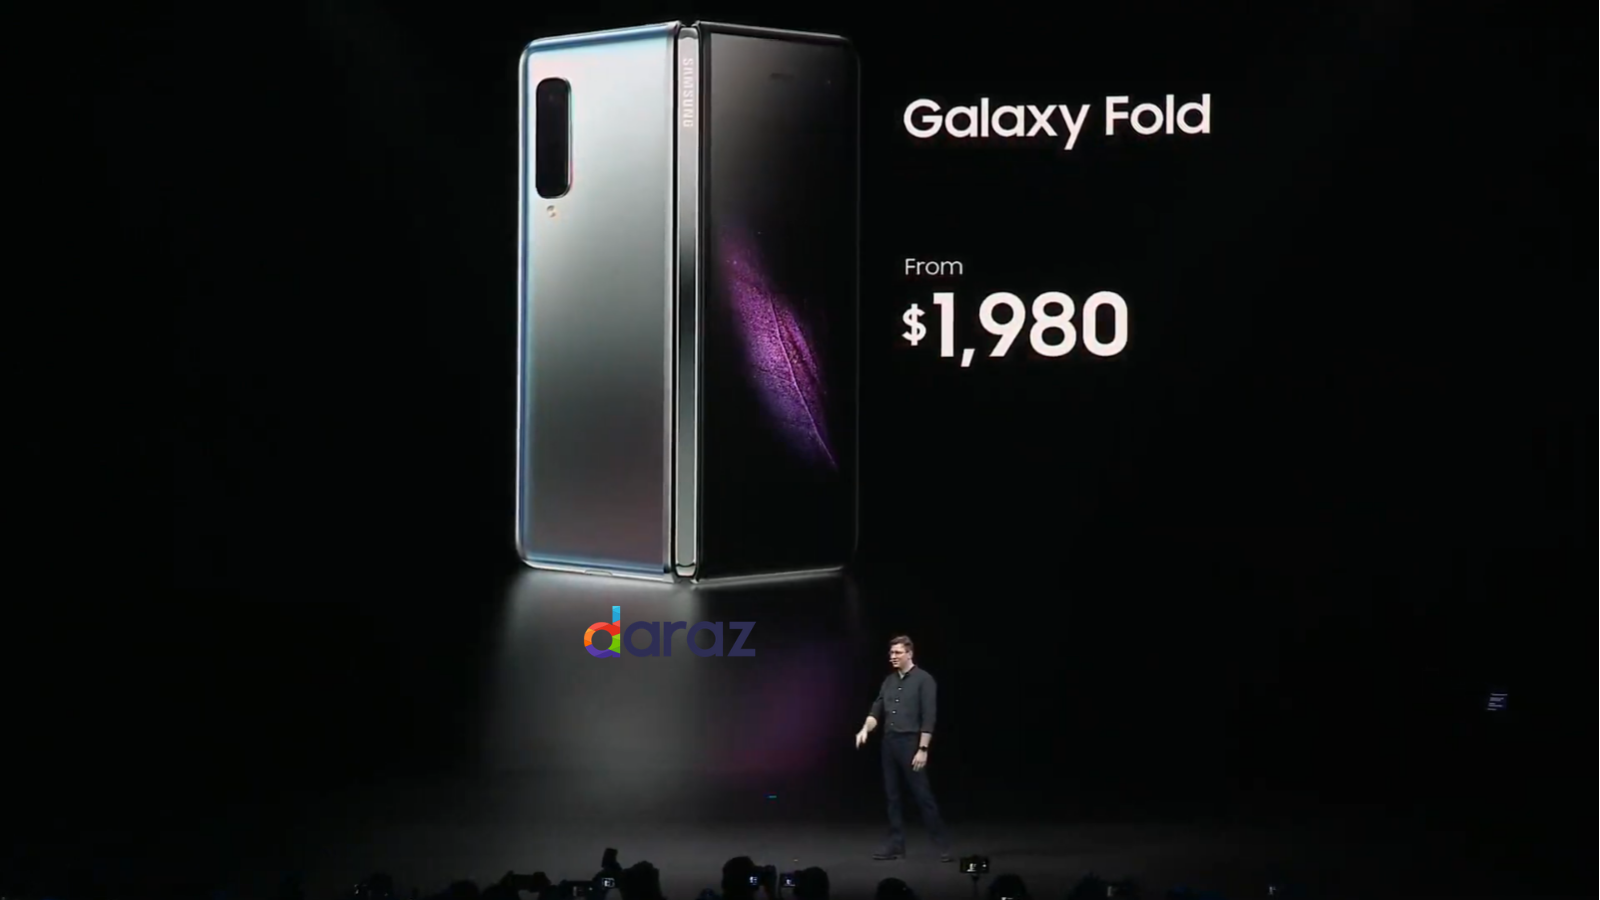 Samsung Galaxy Fold price in Pakistan 2019